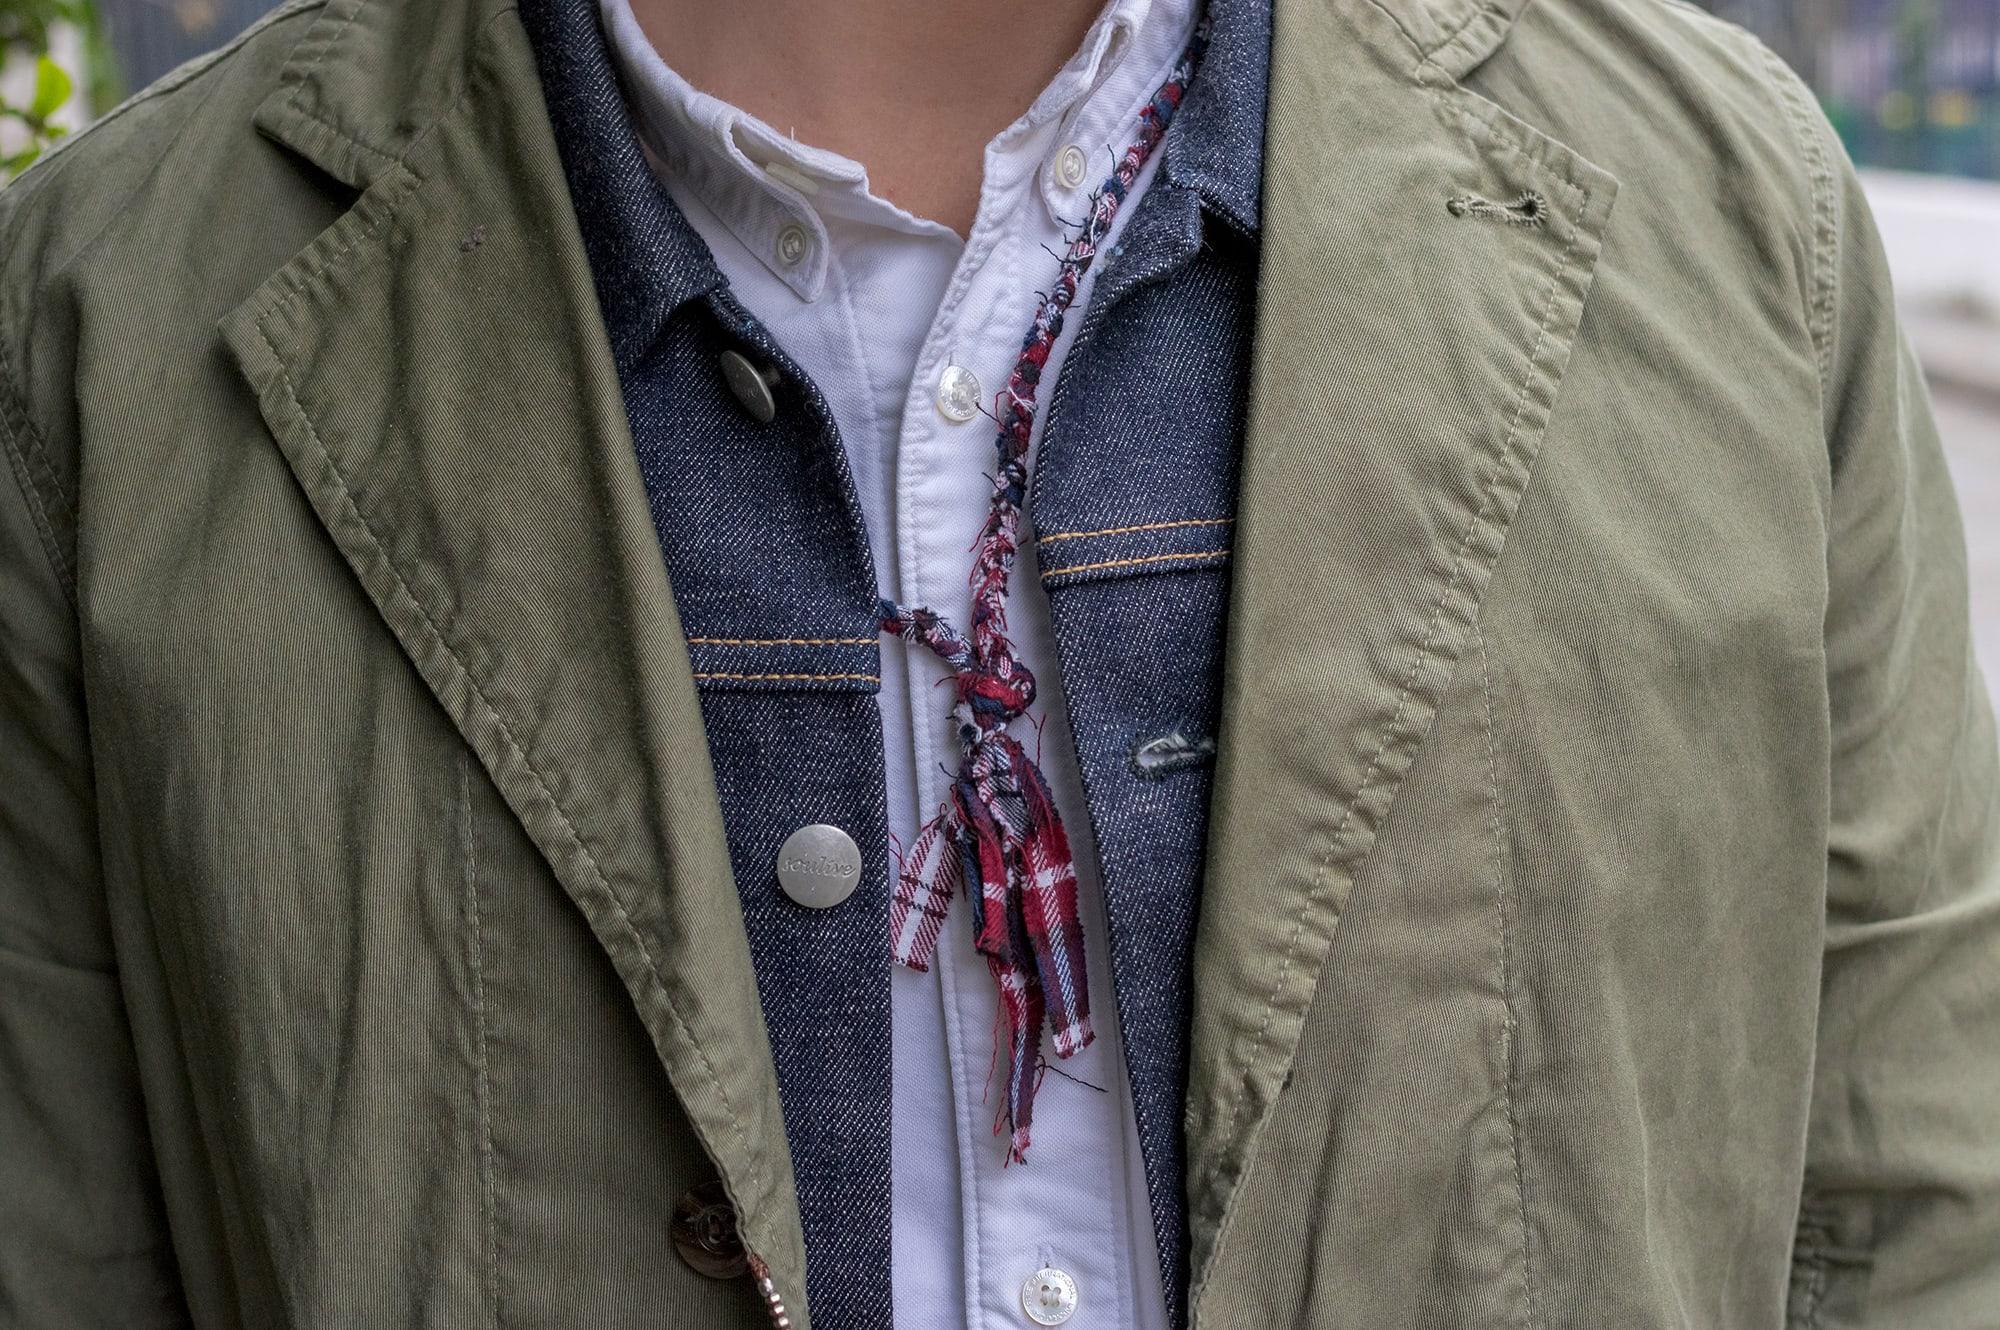 chemise oxford blanche Visvim veste en jean soulive et collier Borali